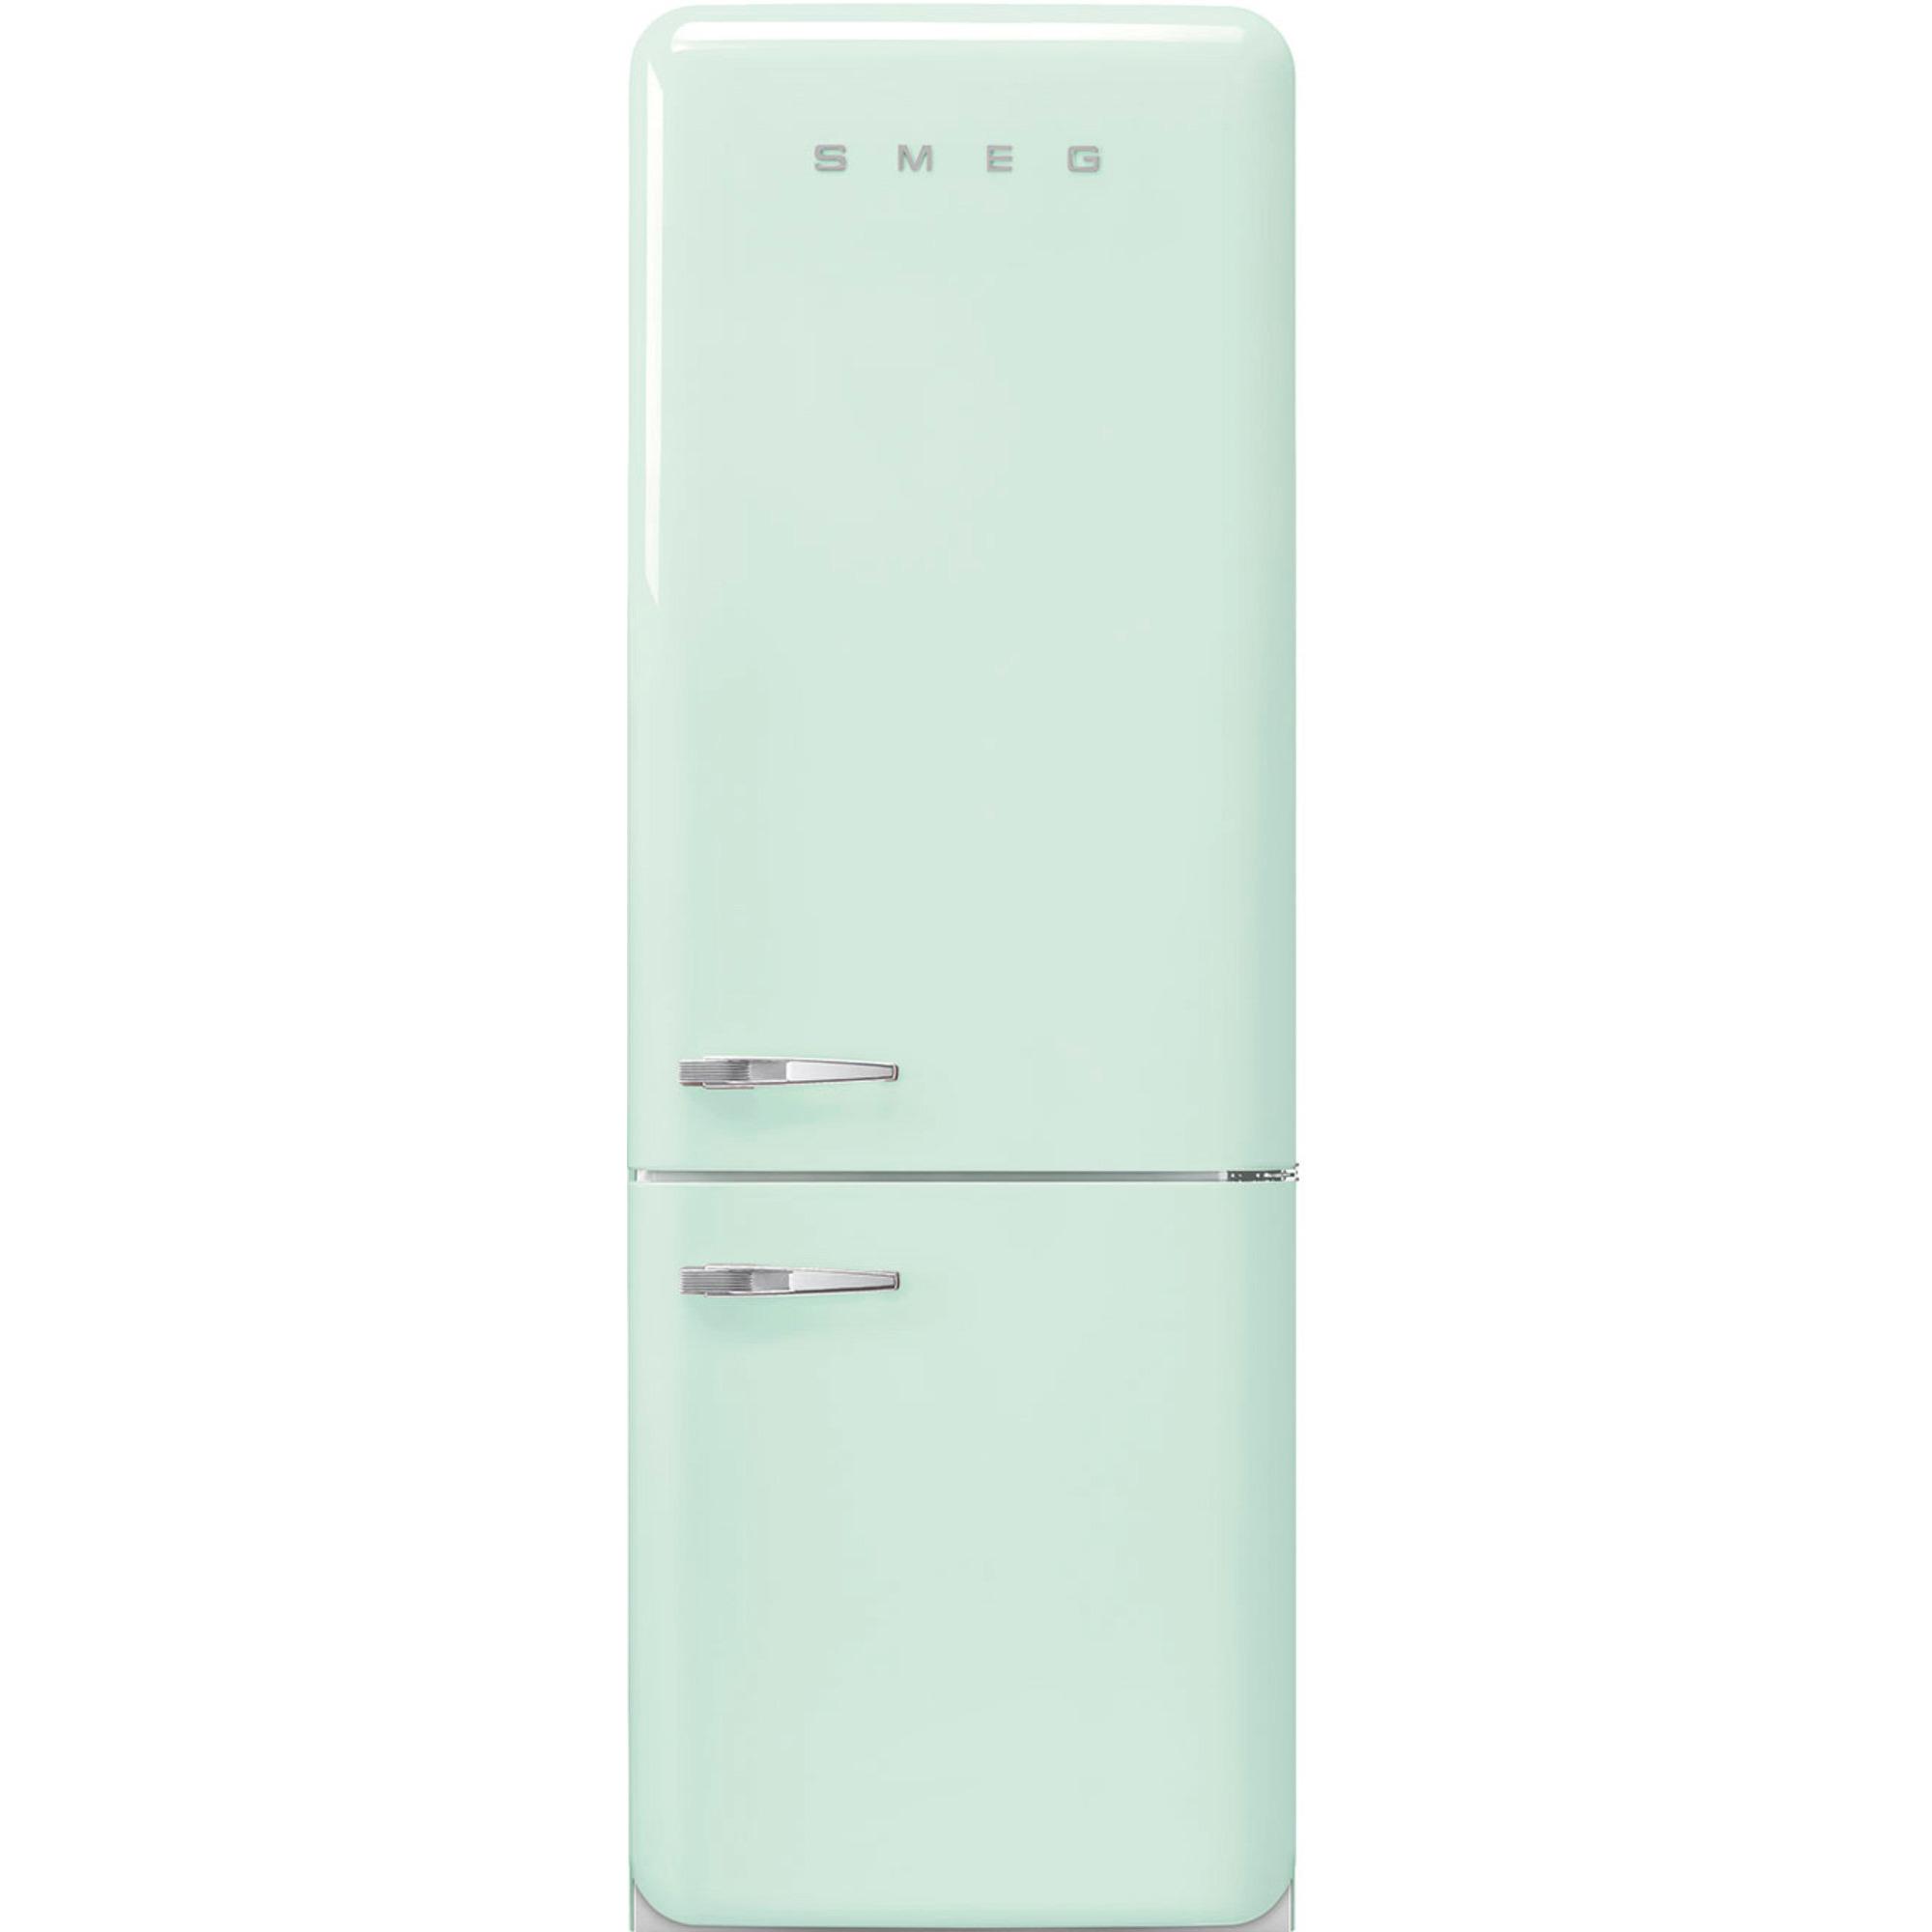 Smeg 205 cm Högerhängt Kylskåp/frys i 50-tals Retrodesign Pastellgrön